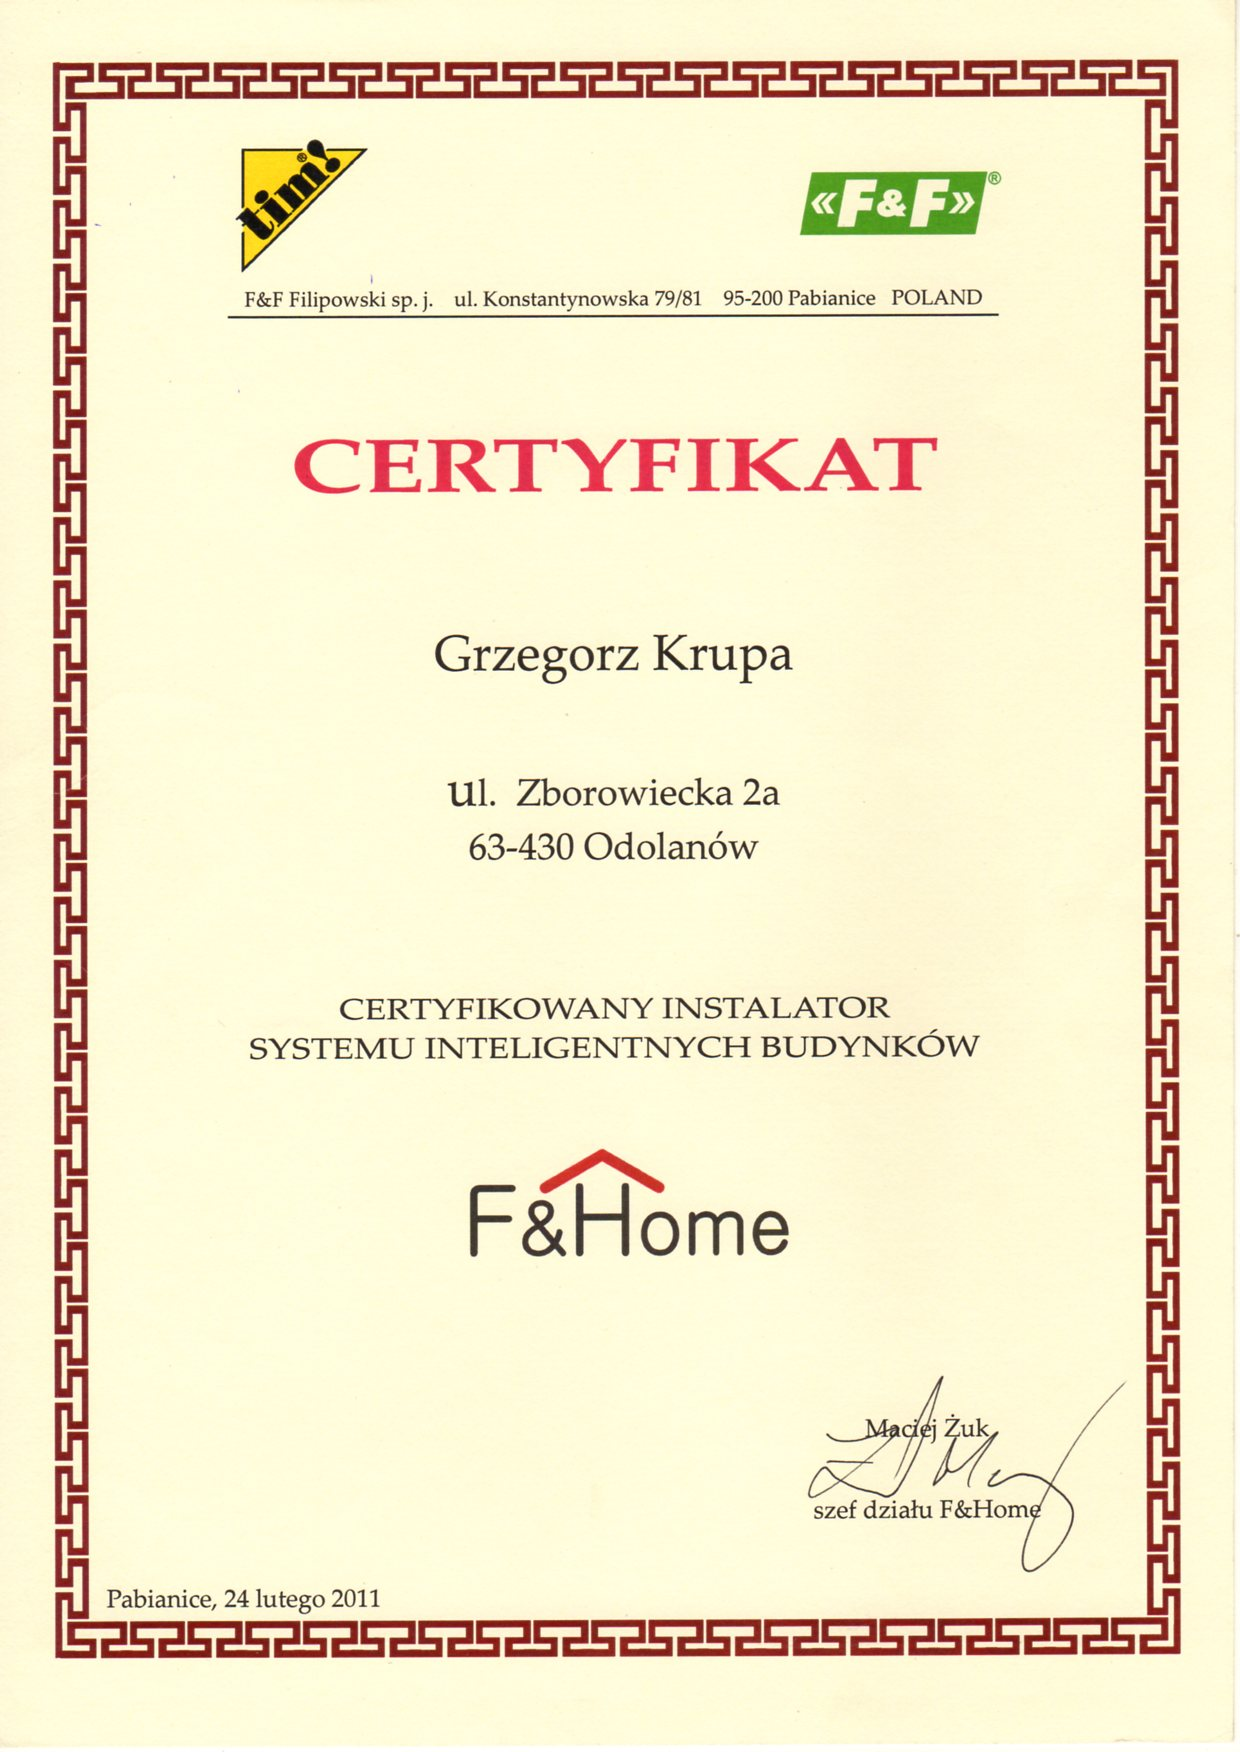 F&Home certyfikat instalatora